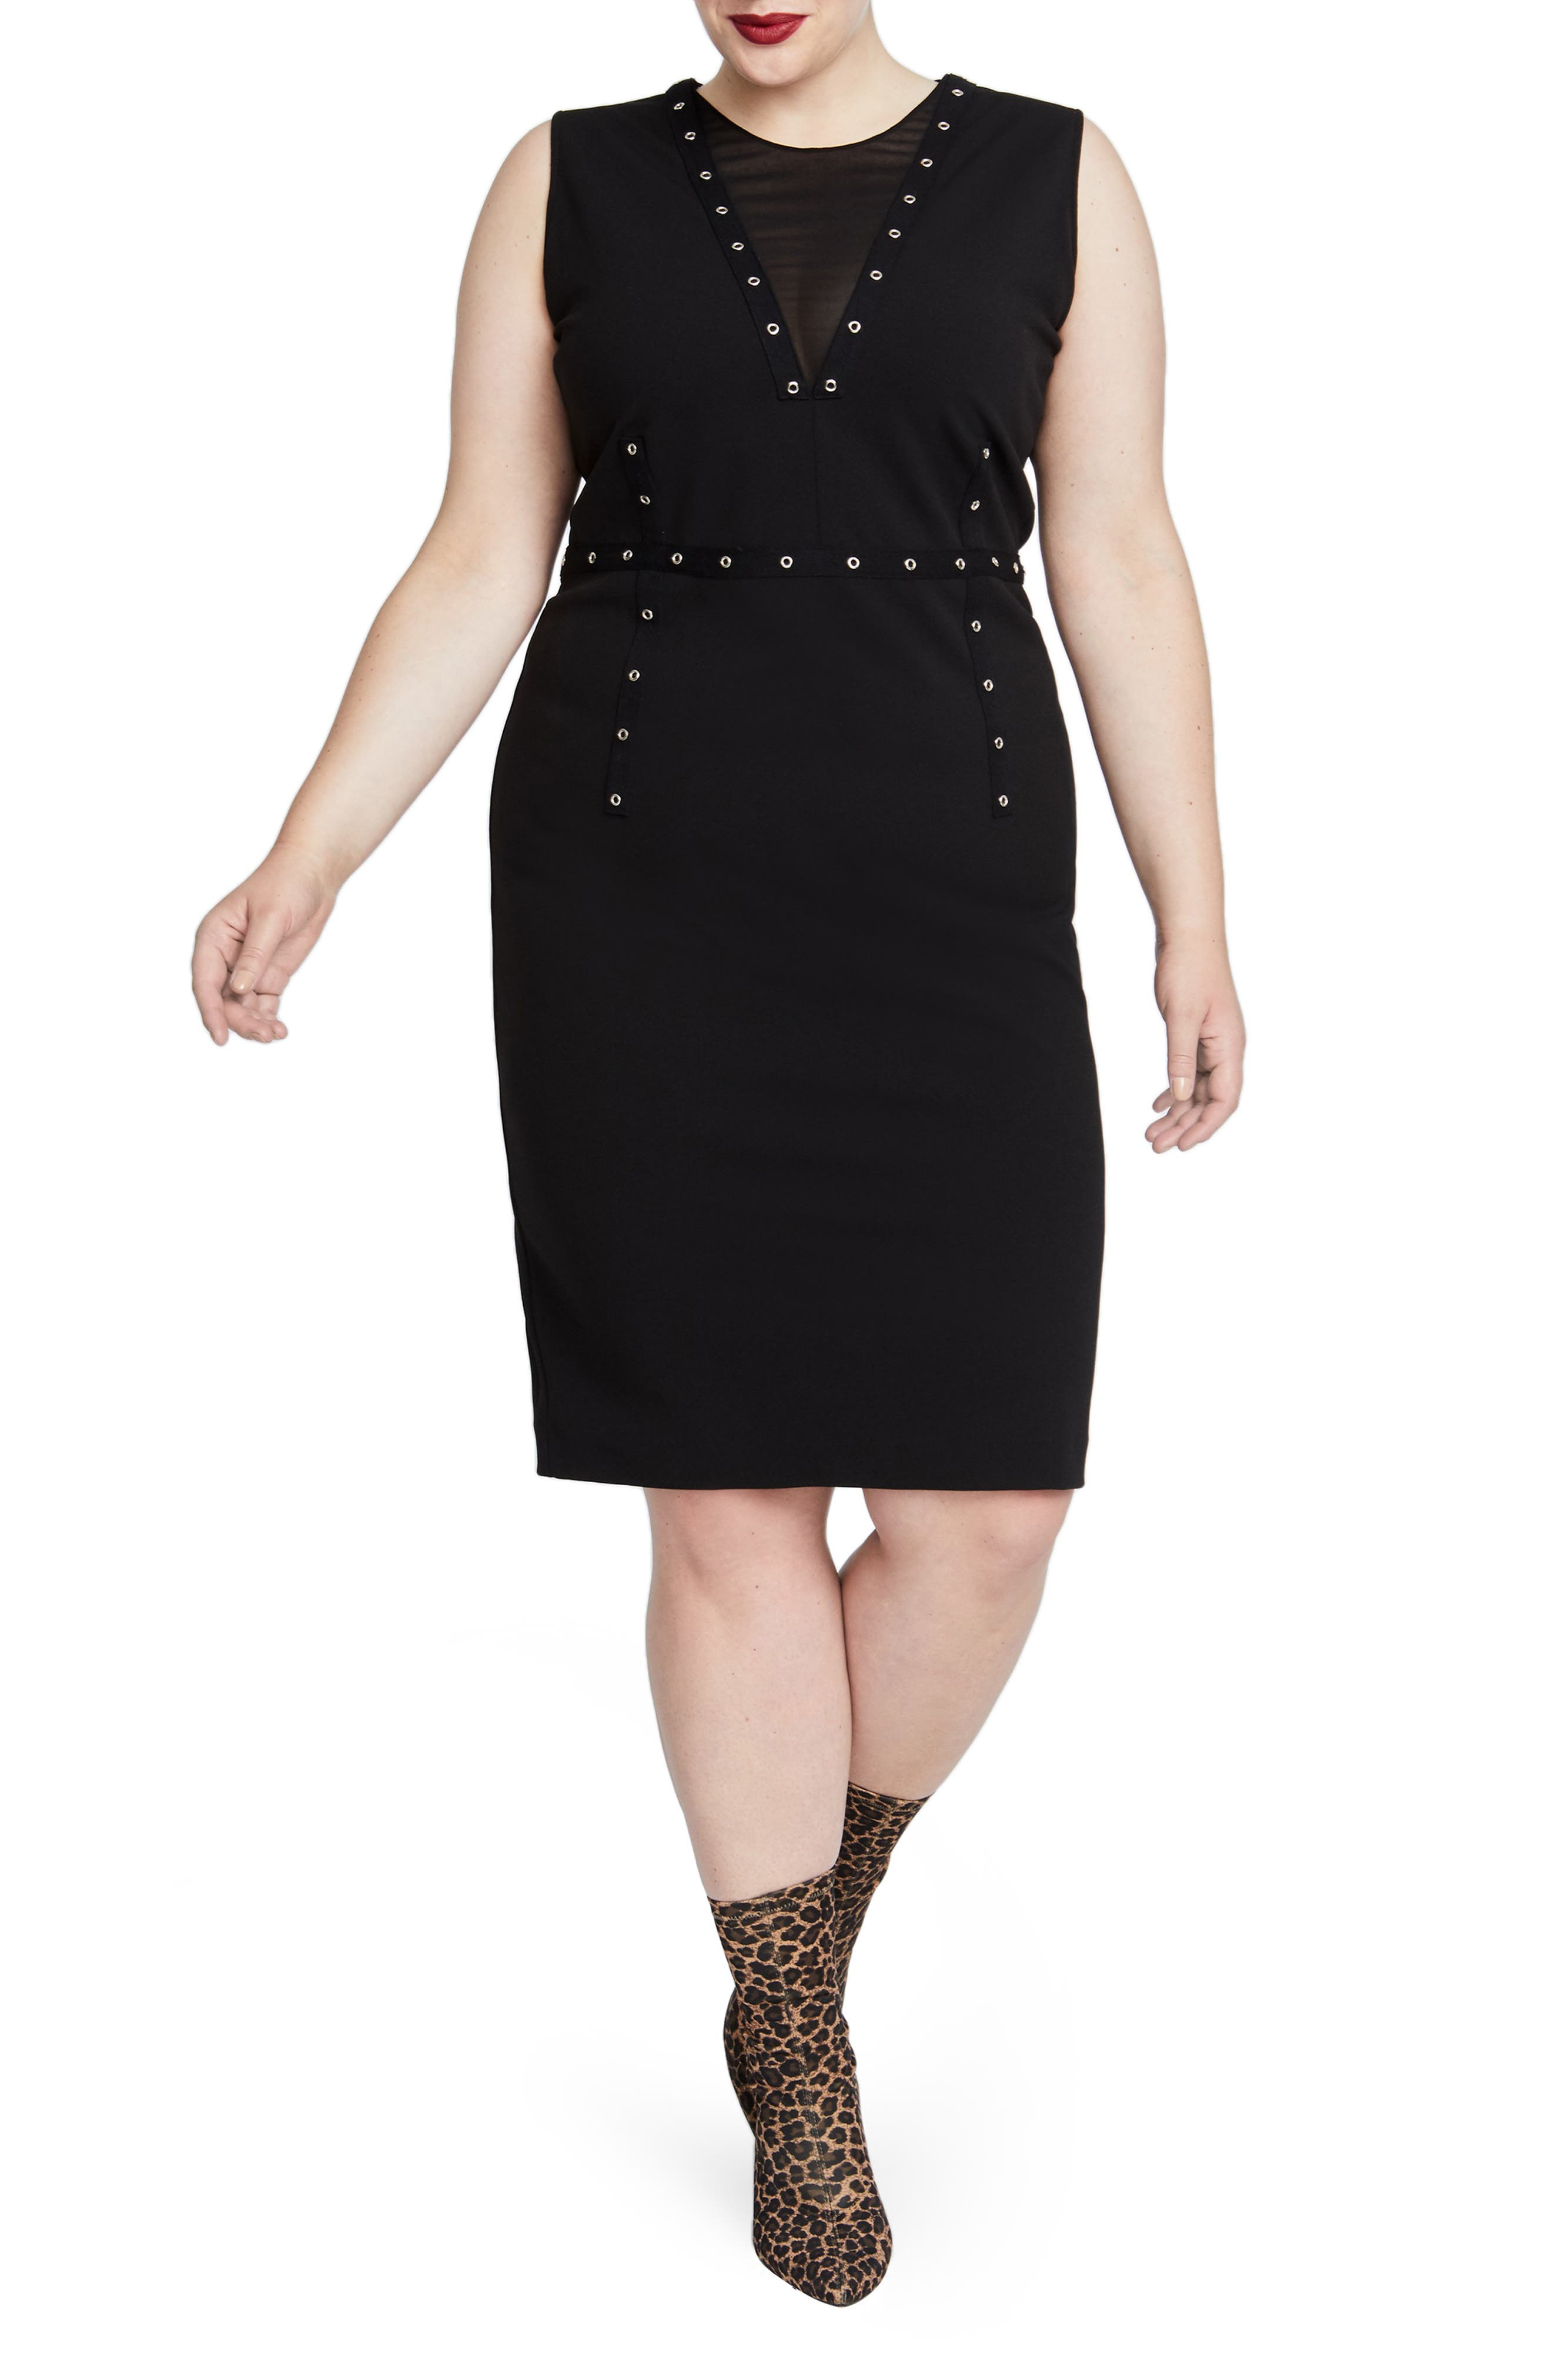 Plus Size Rachel Rachel Roy Zane Sleeveless Sheath Dress